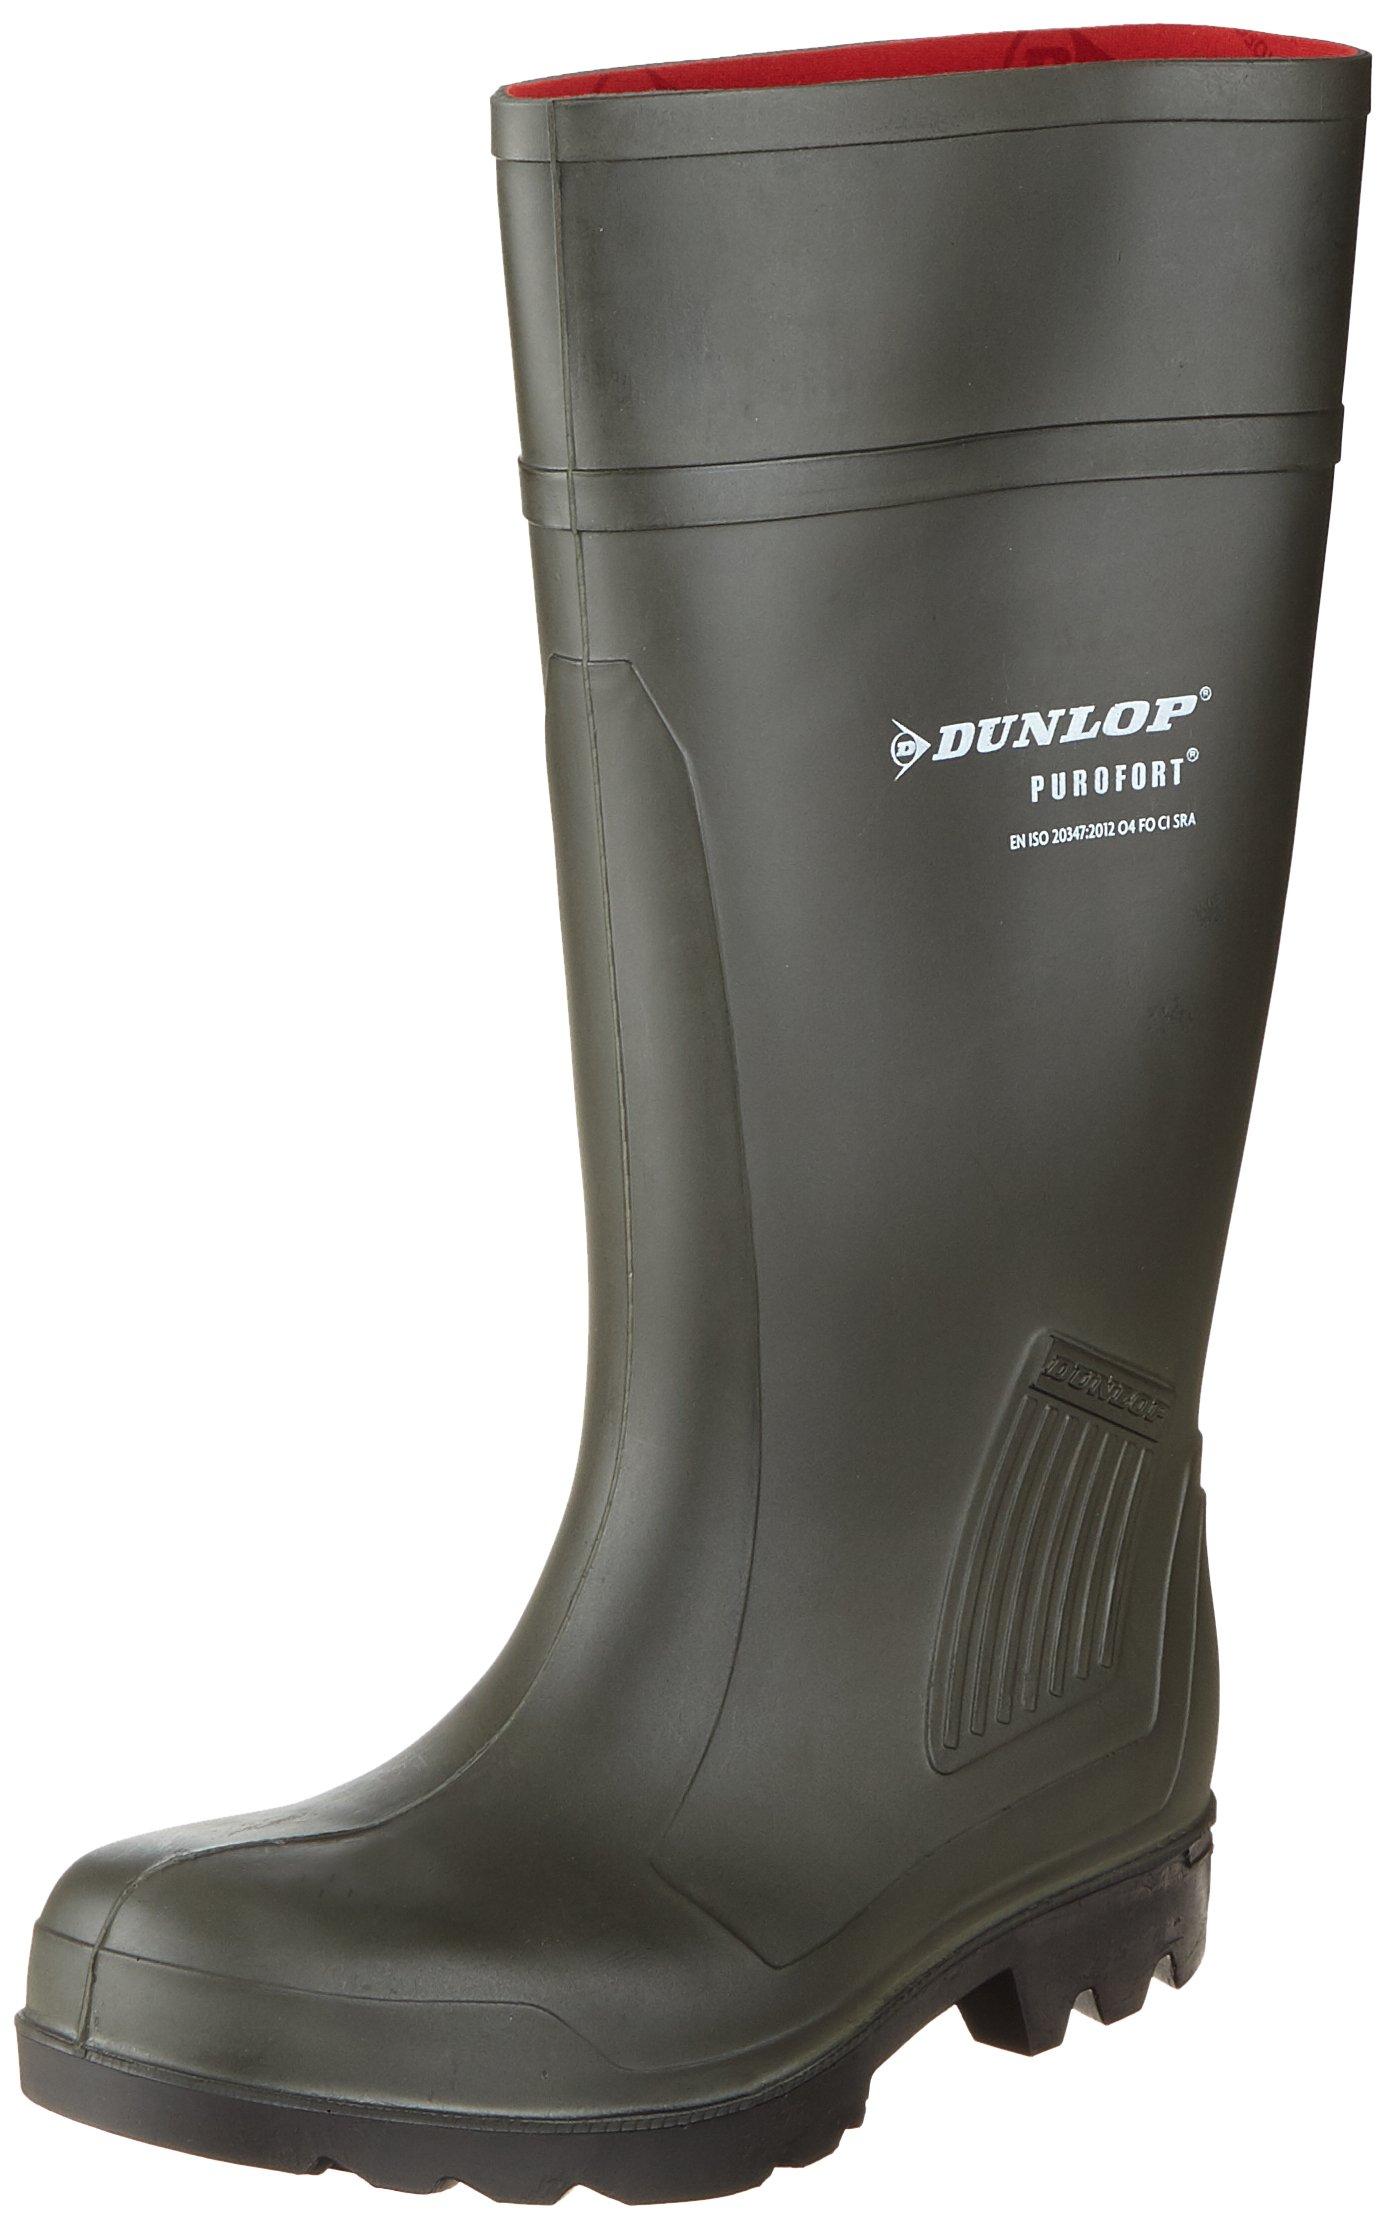 Dunlop Purofort Professional Dark Green/Black, without steel toe D460933 Size - 6